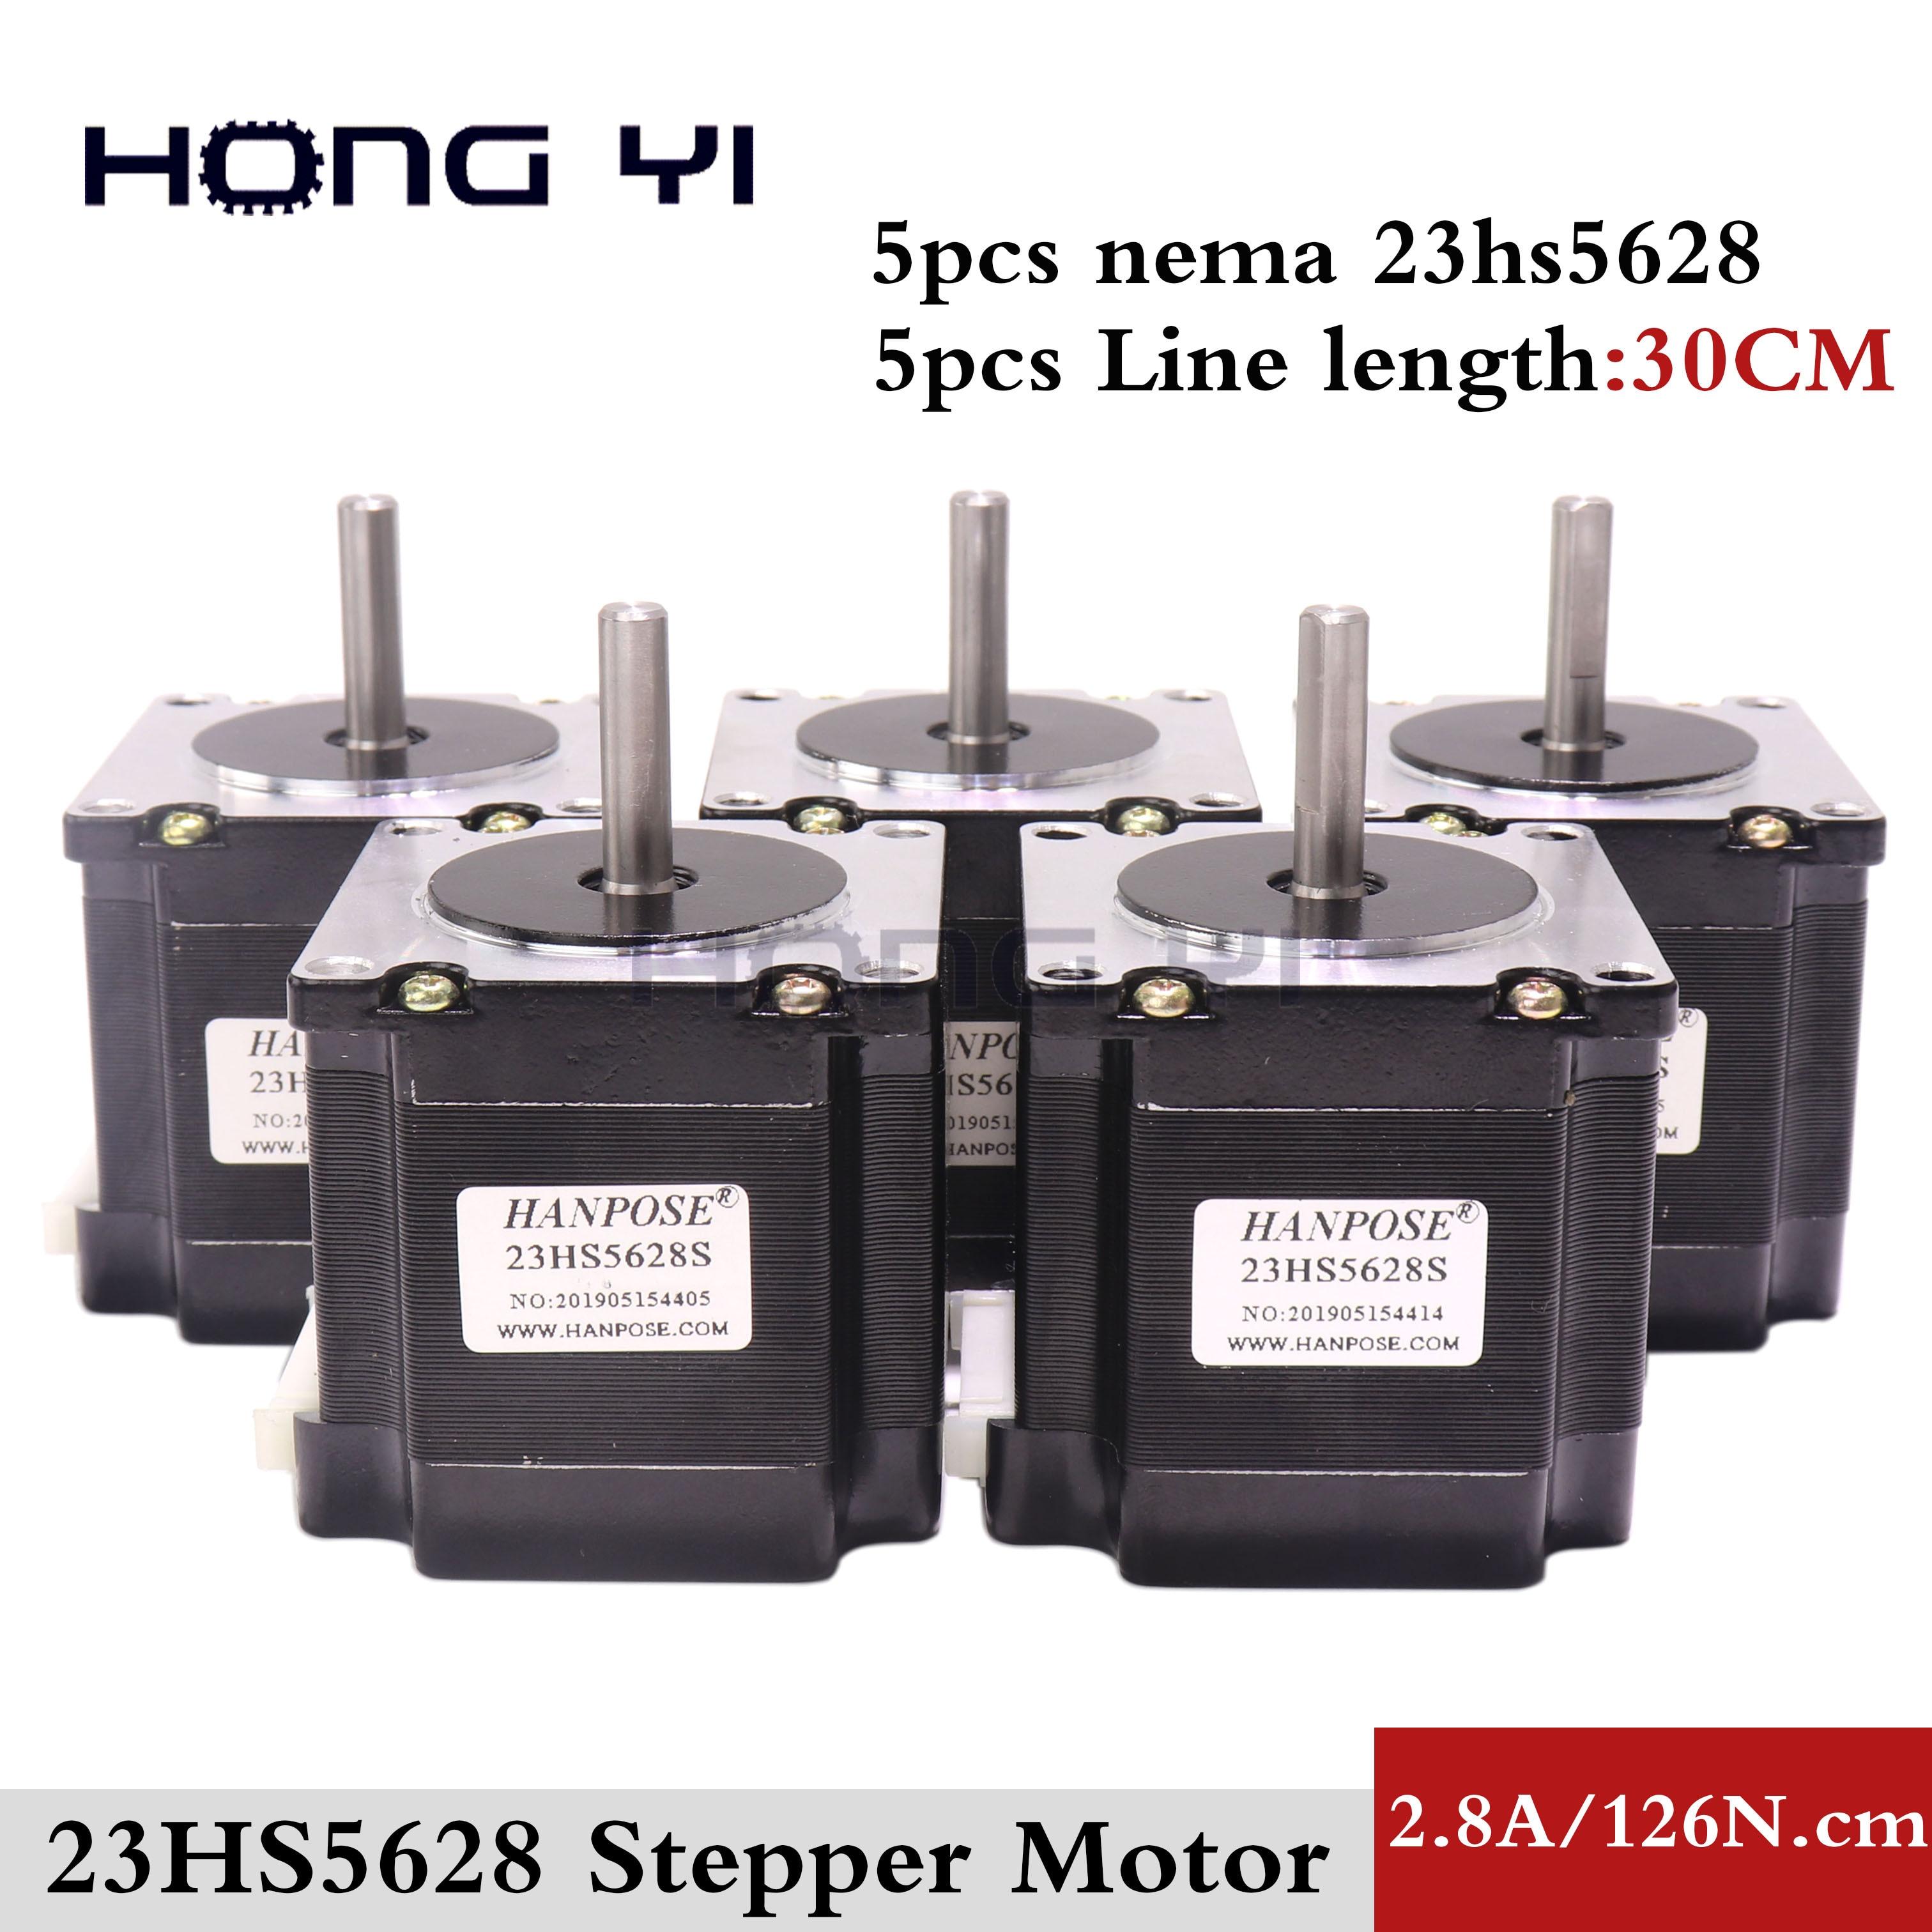 Free shipping 5PCS 23HS5628 4 lead Nema 23 Stepper Motor 57 motor NEMA23 Stepper Motor 2